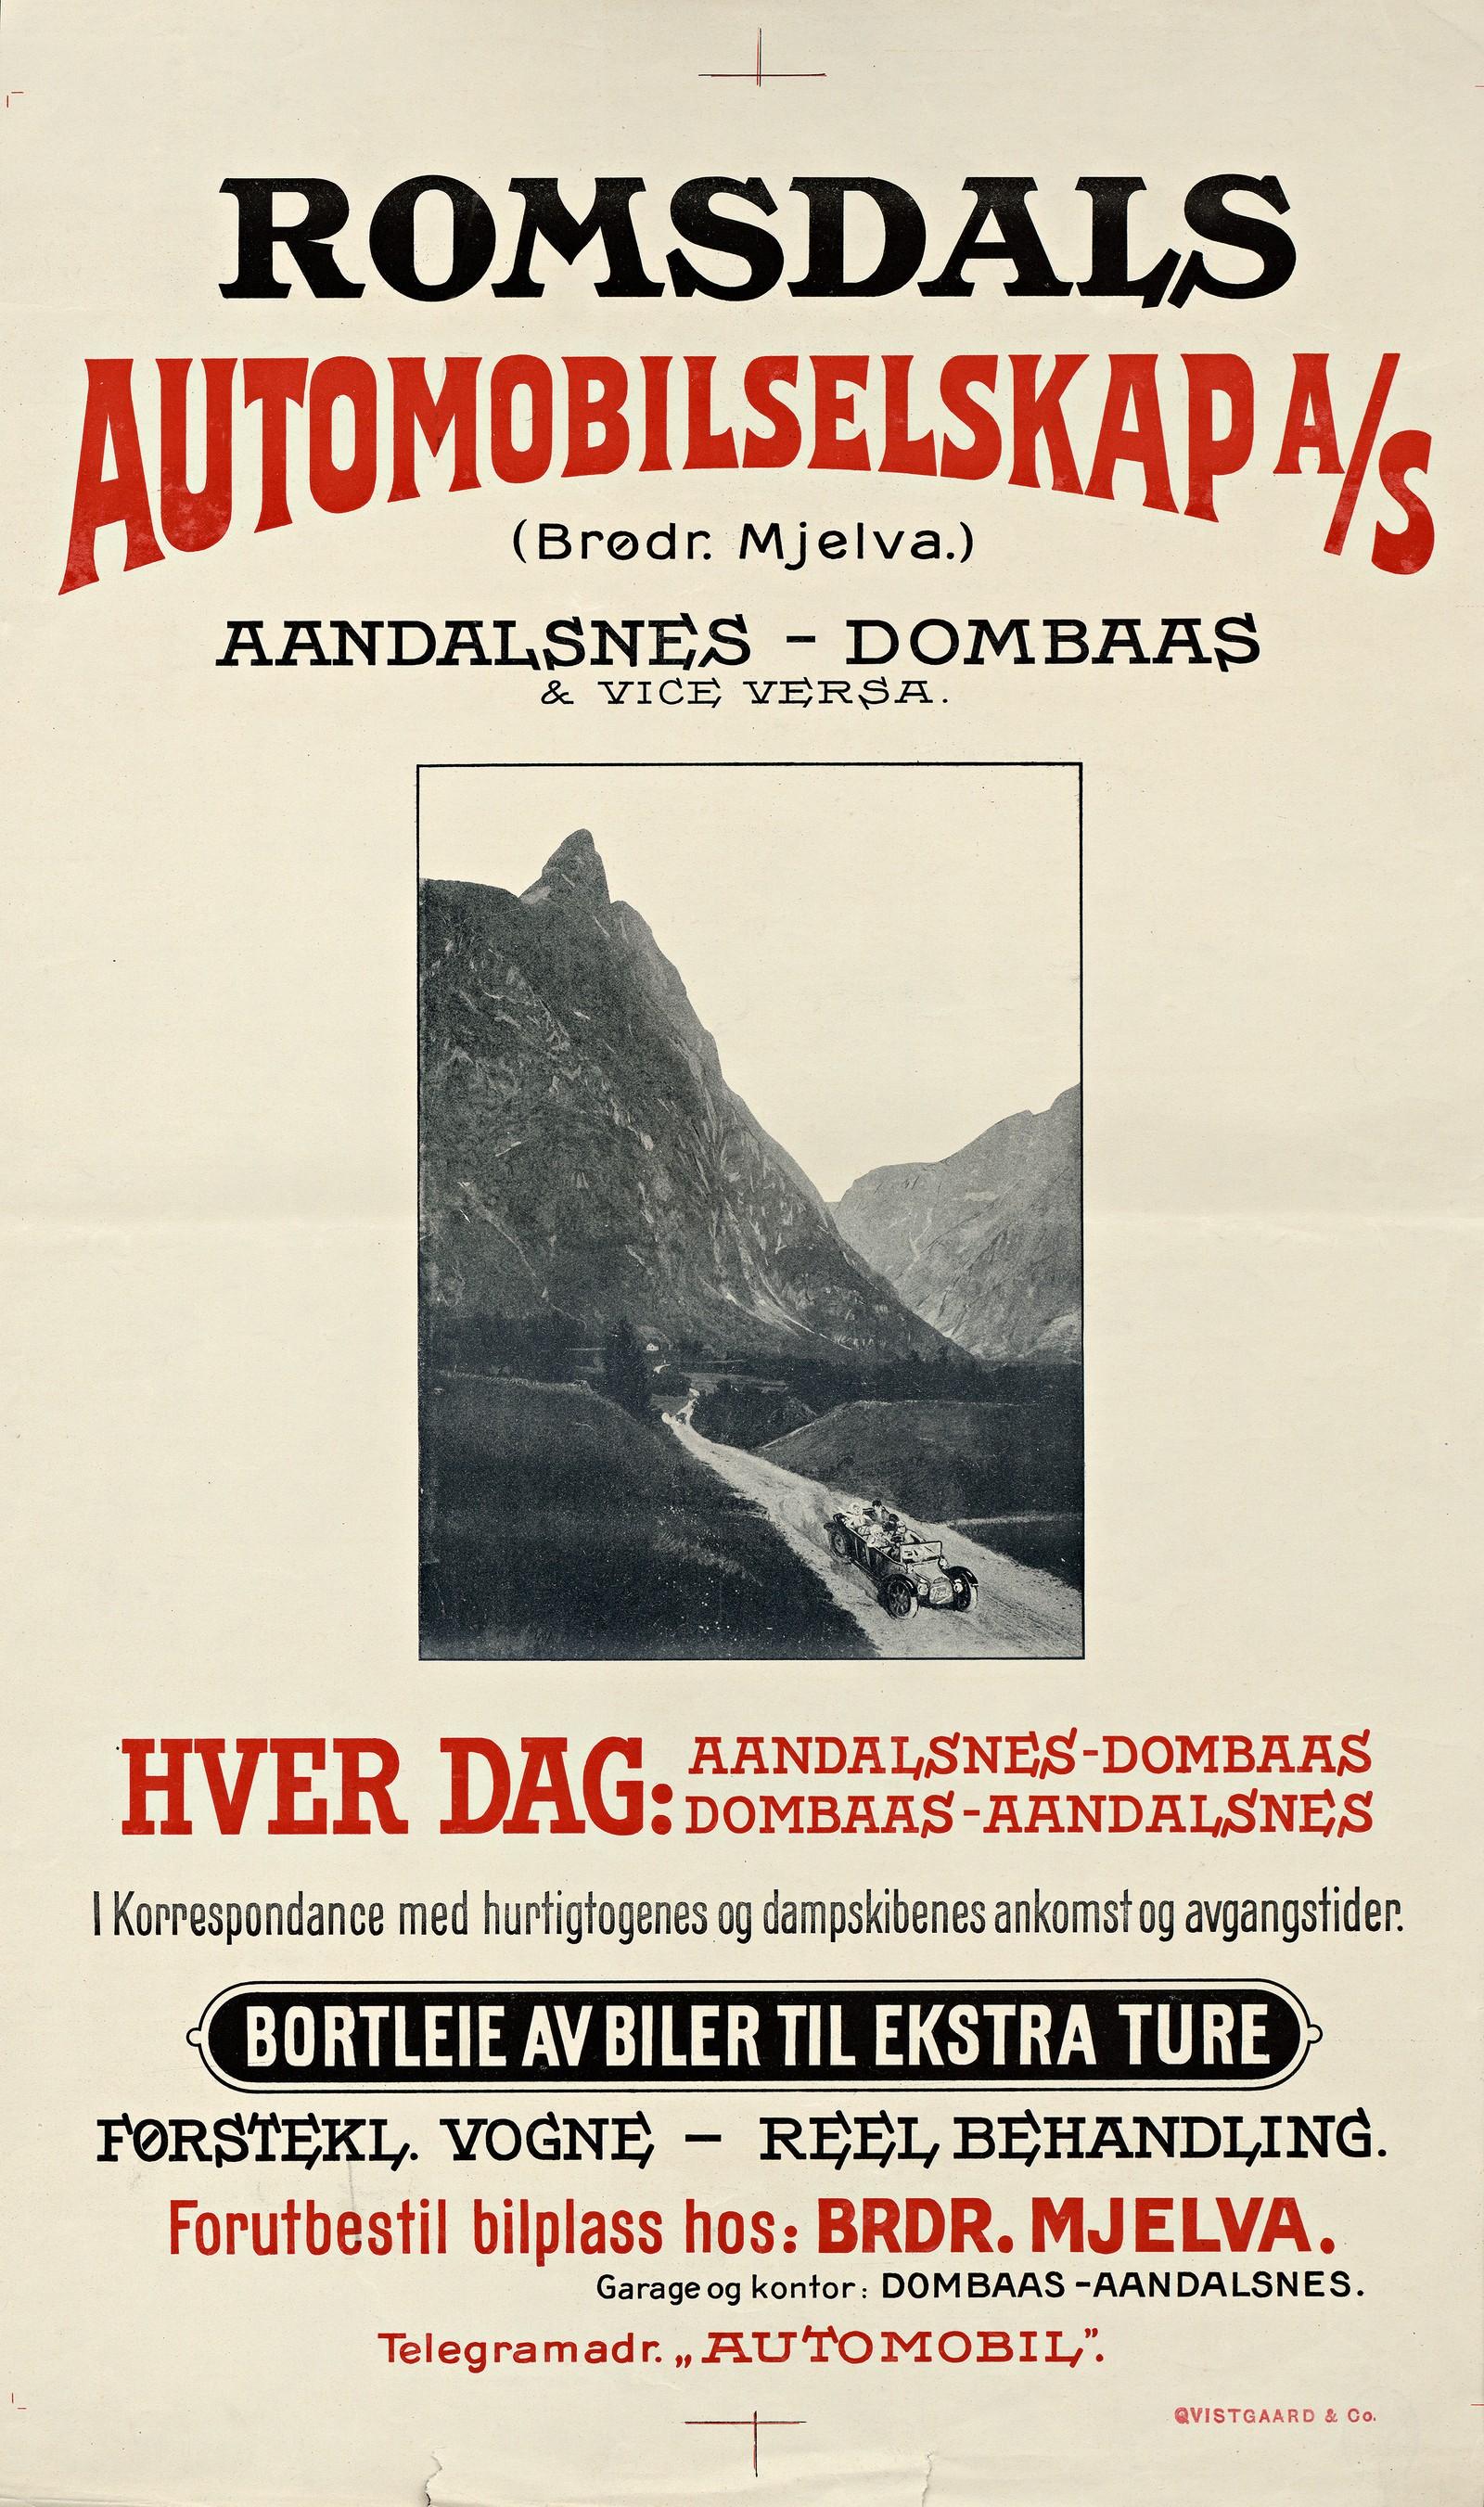 Romsdals Automobilselskap A/S (Brødr. Mjelva.) : Aandalsnes - Dombaas & vice versa. Plakat fra 1924.